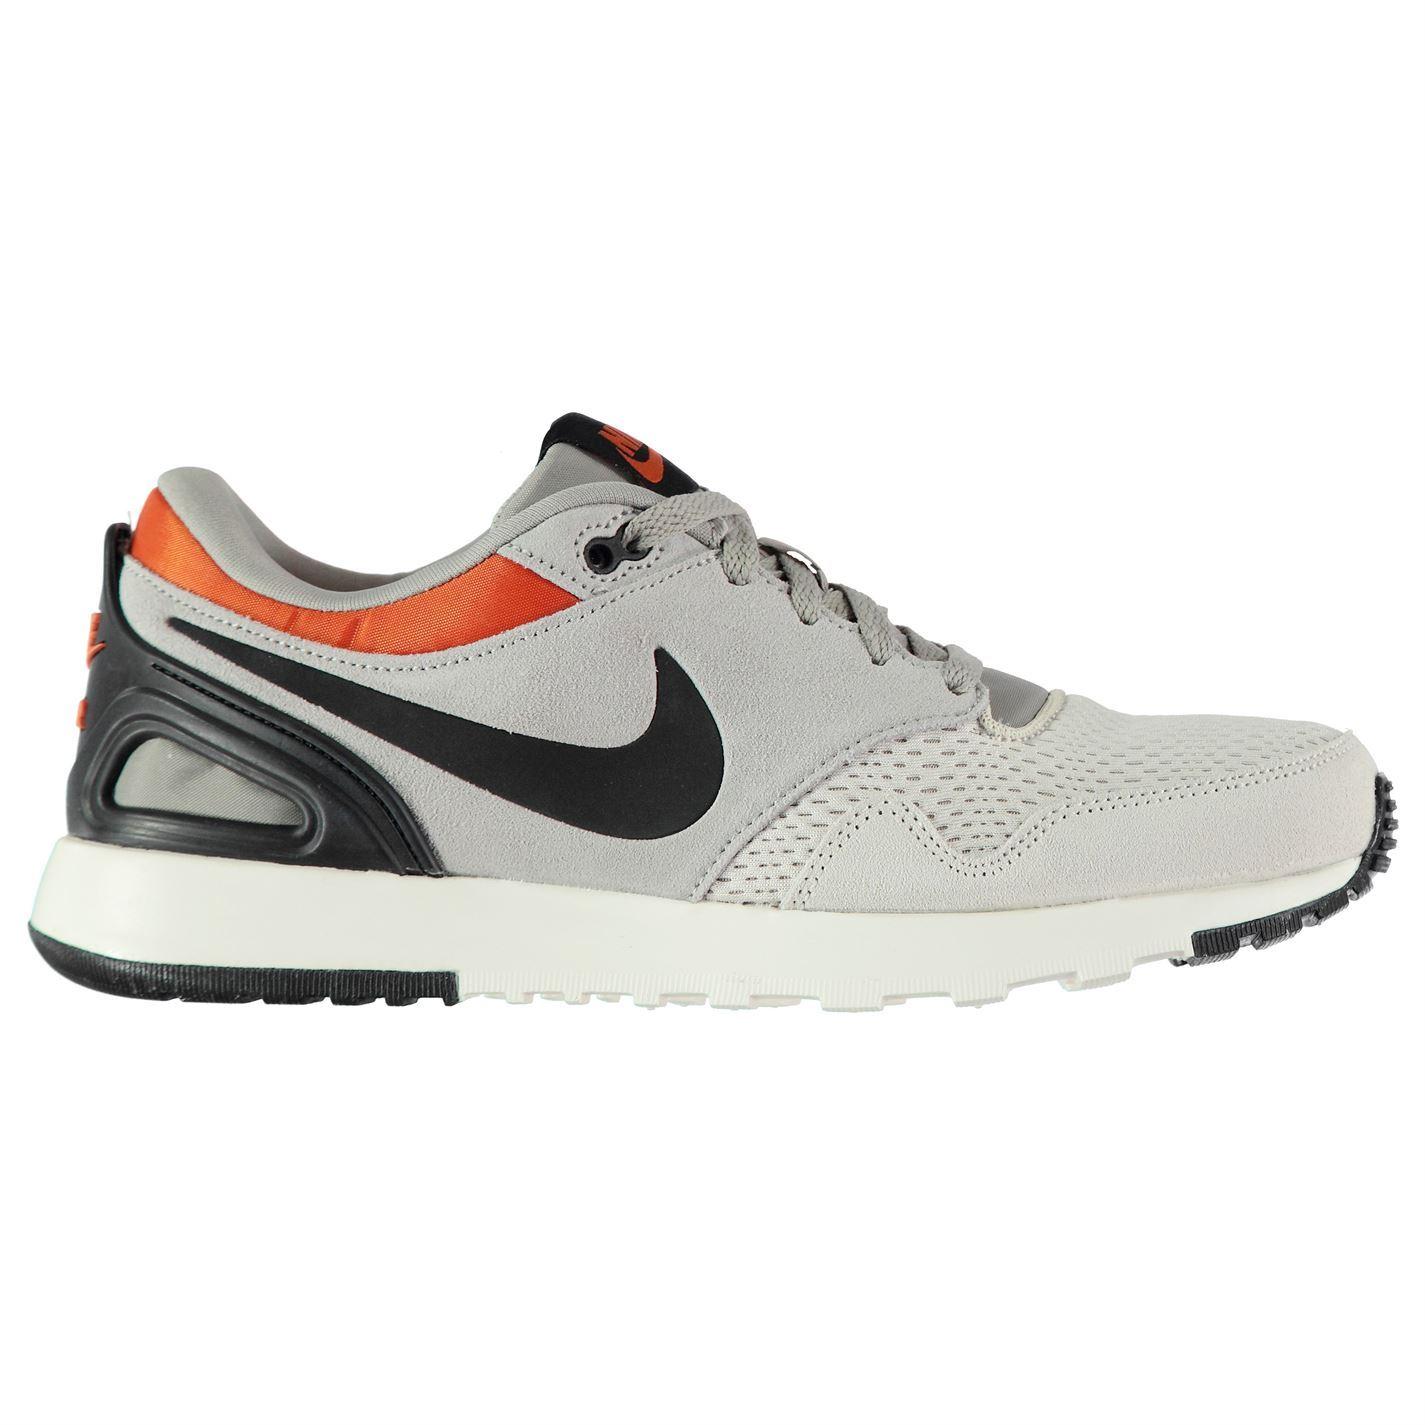 Nike Air Max Vibenna Trainers Uomo Grey/Nero/Red Athletic  Shoes